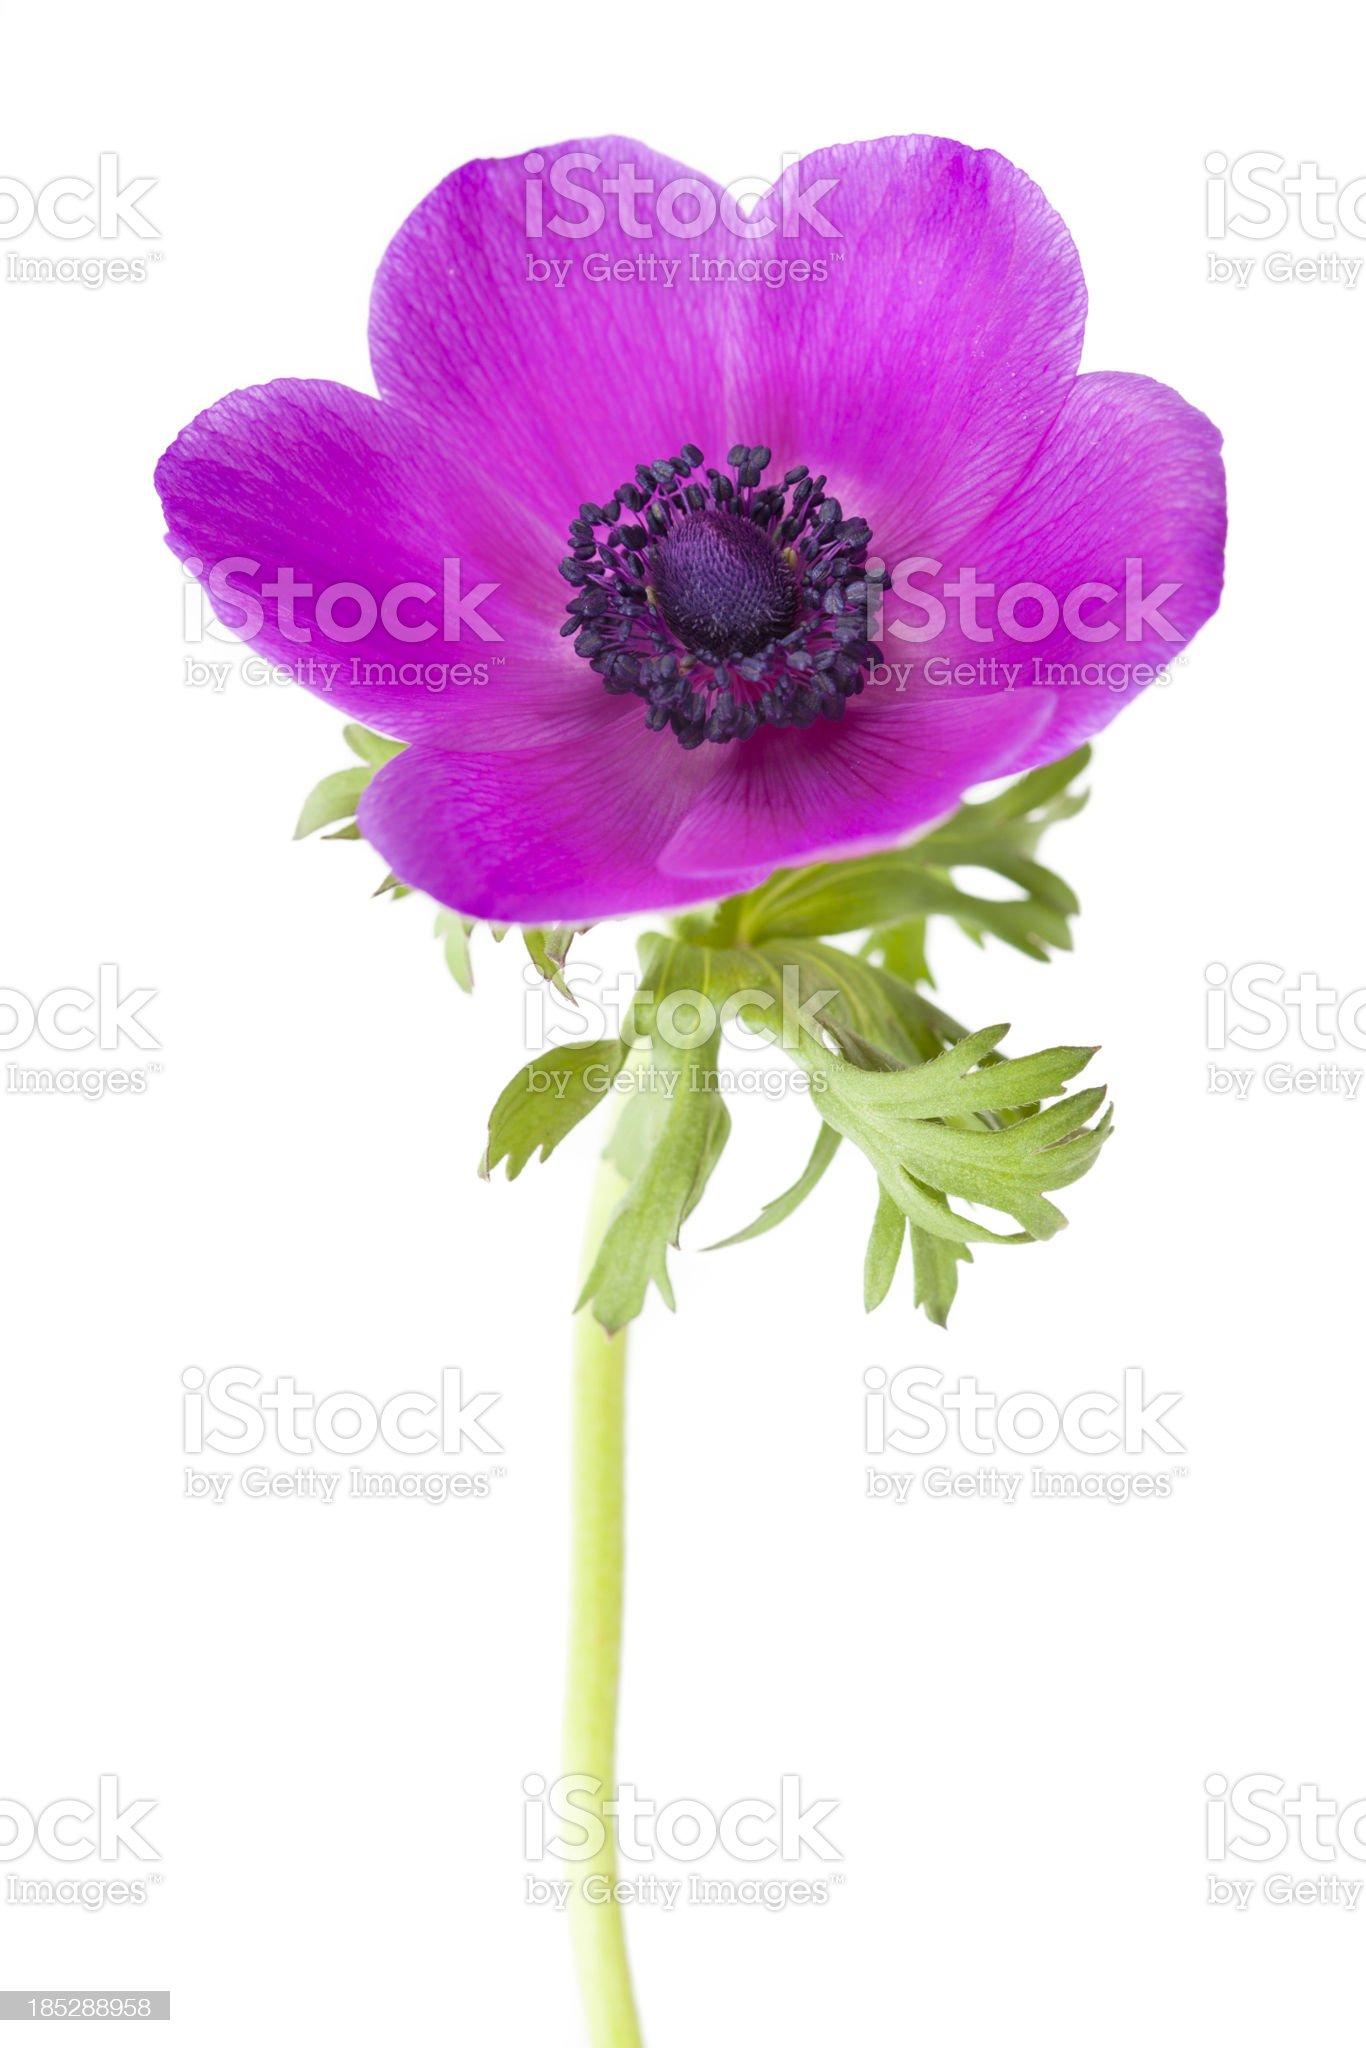 Anemone coronaria Flower royalty-free stock photo